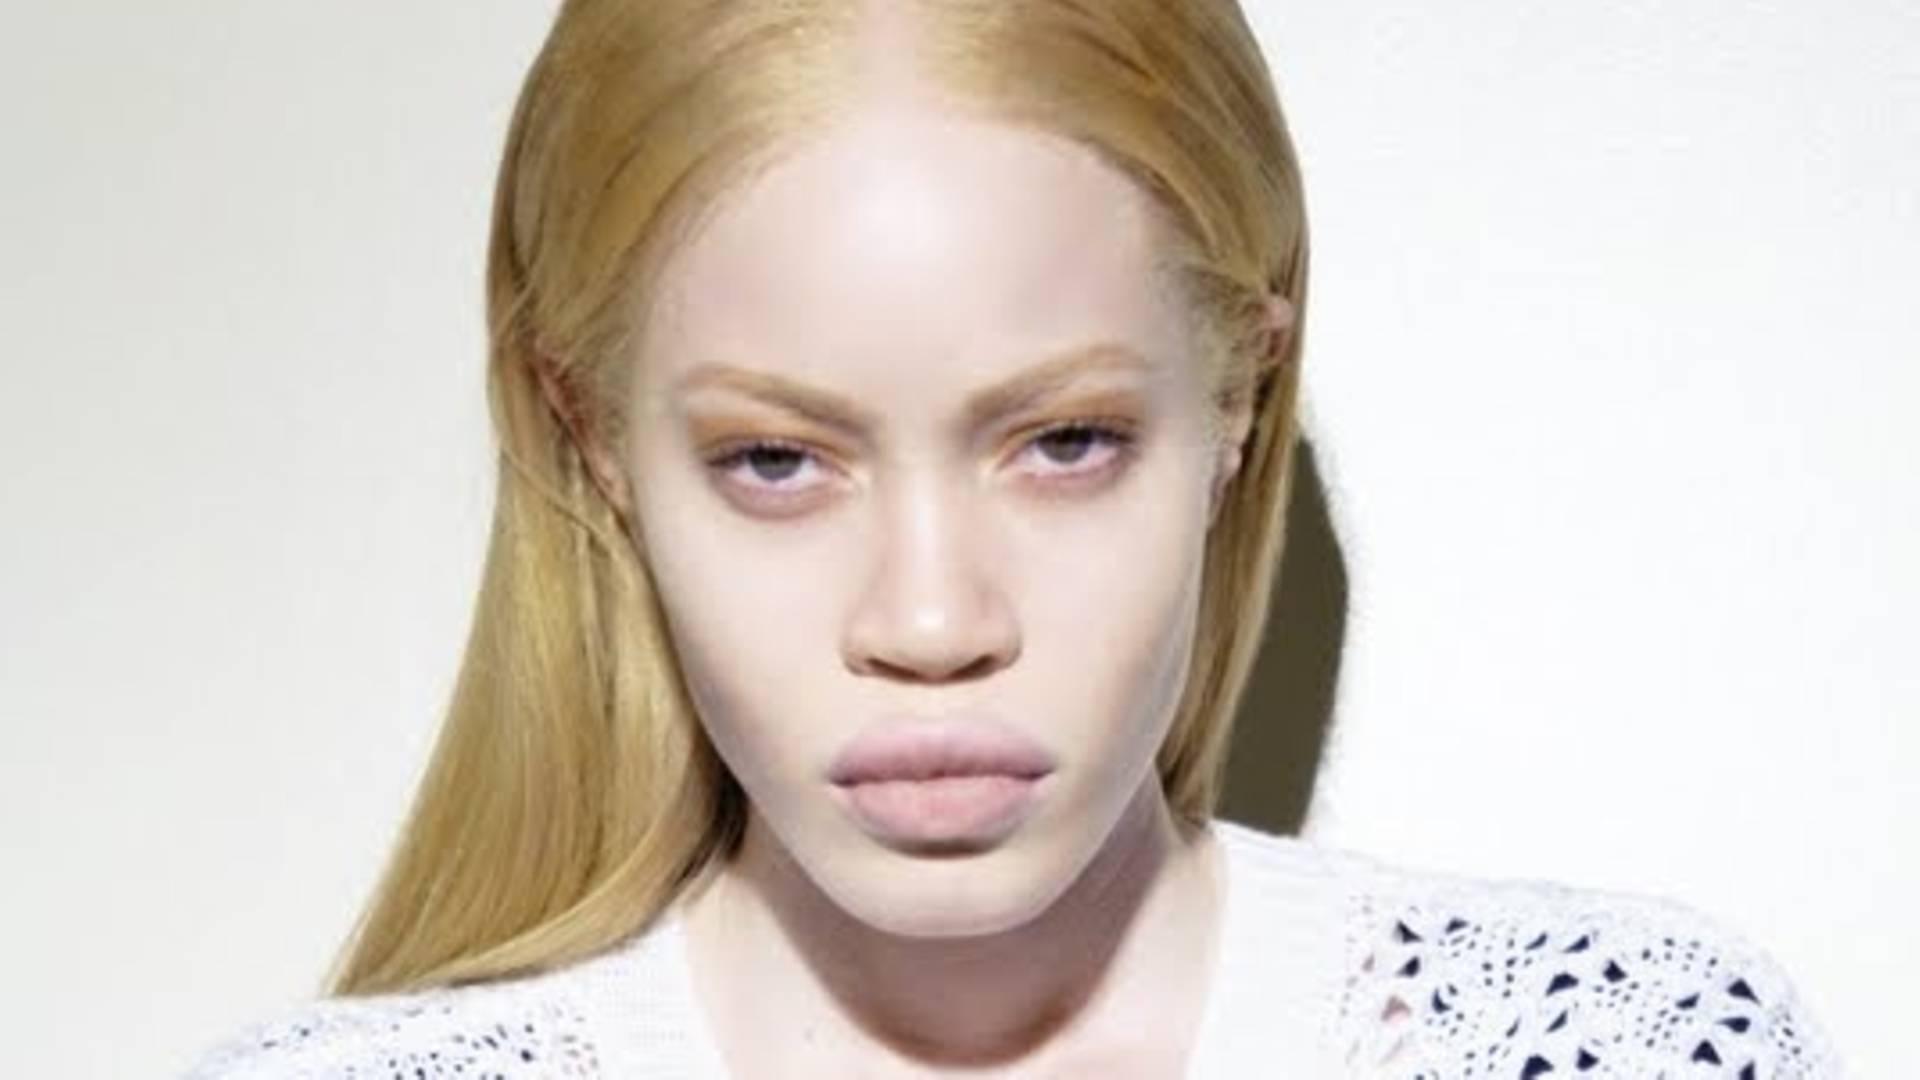 Albino model hairstyles